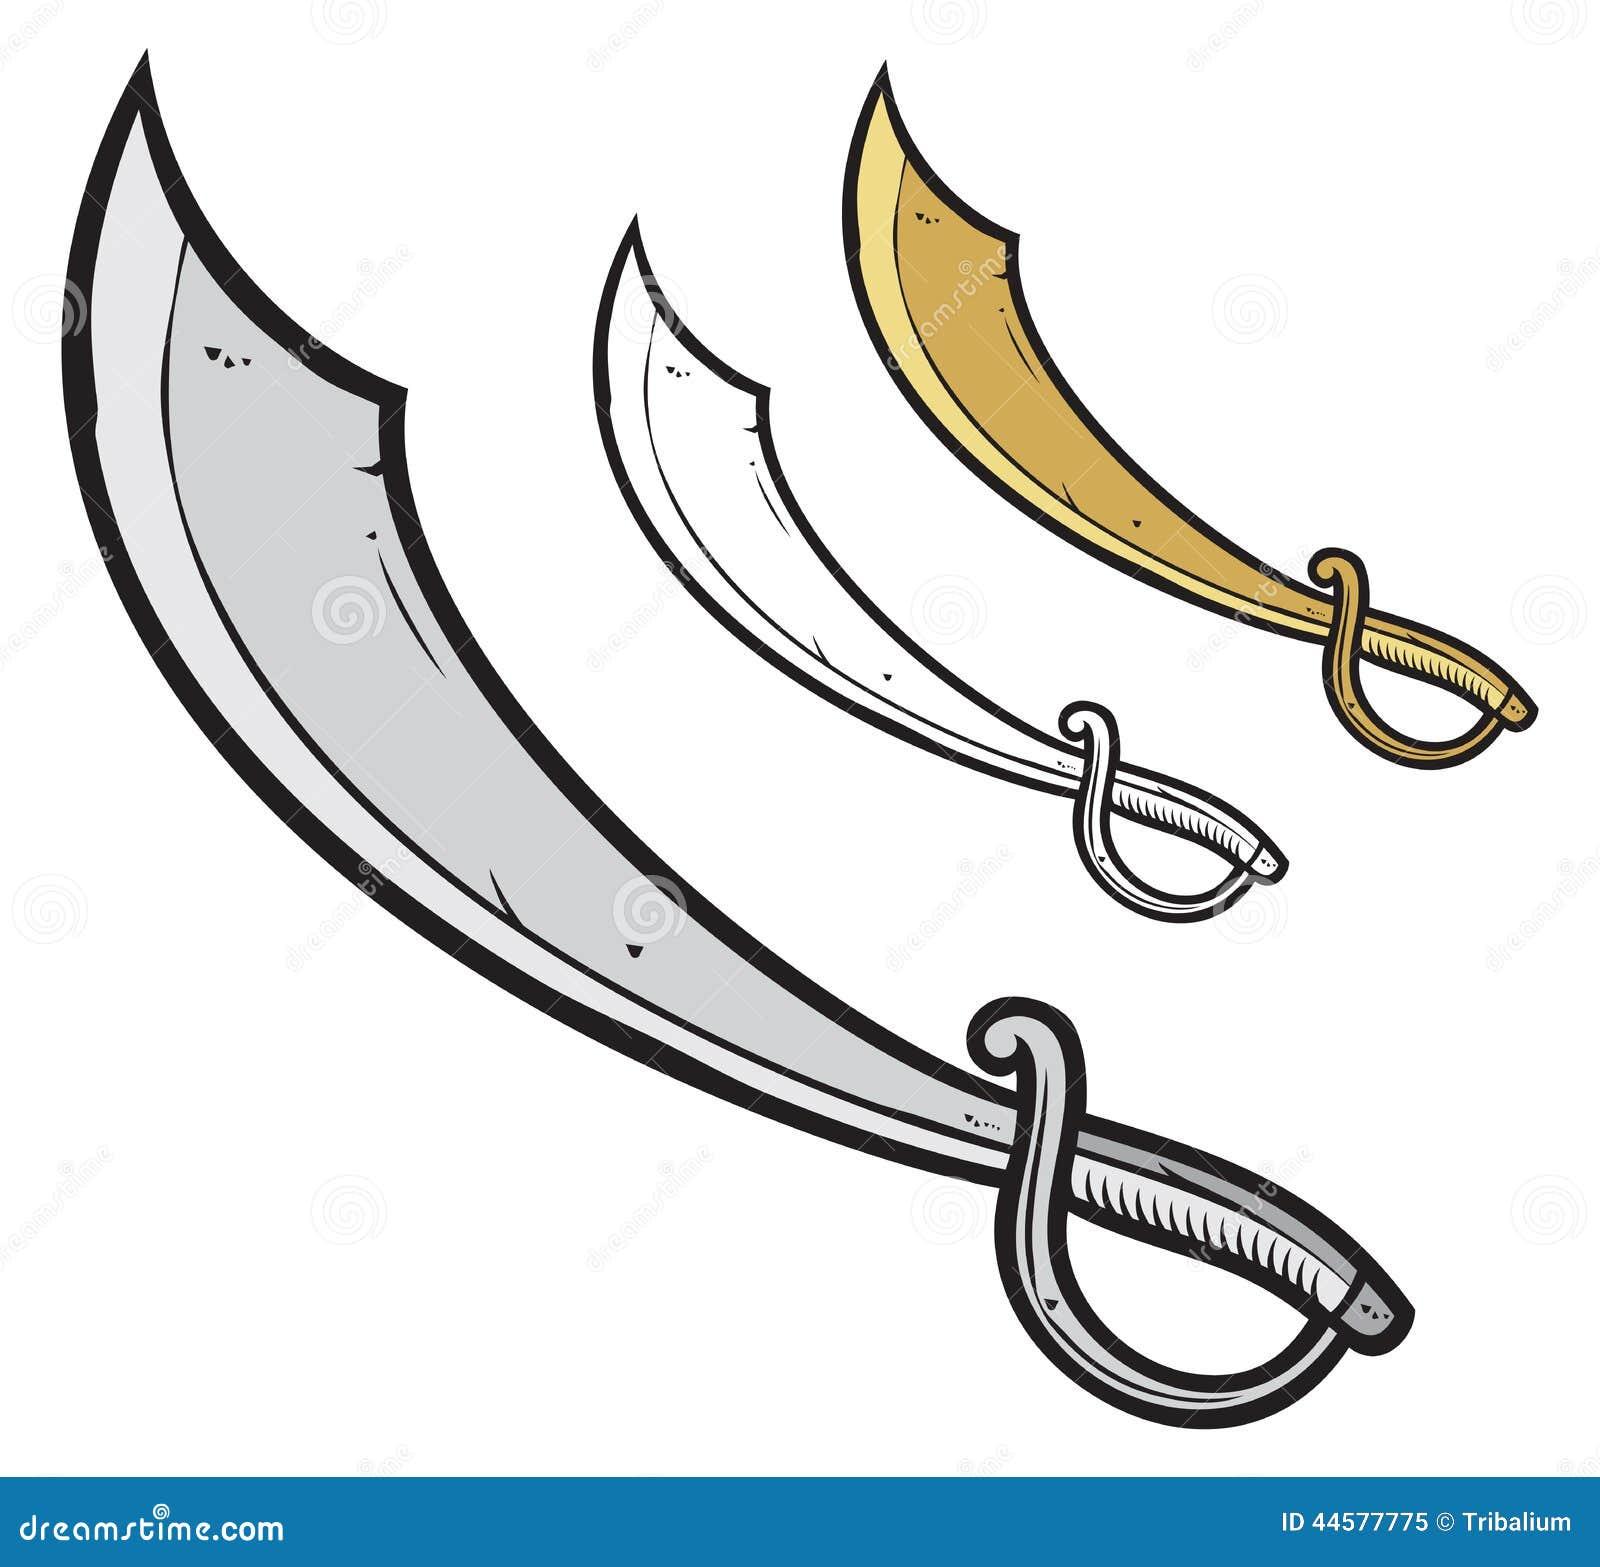 Оружие пирата из картона своими руками